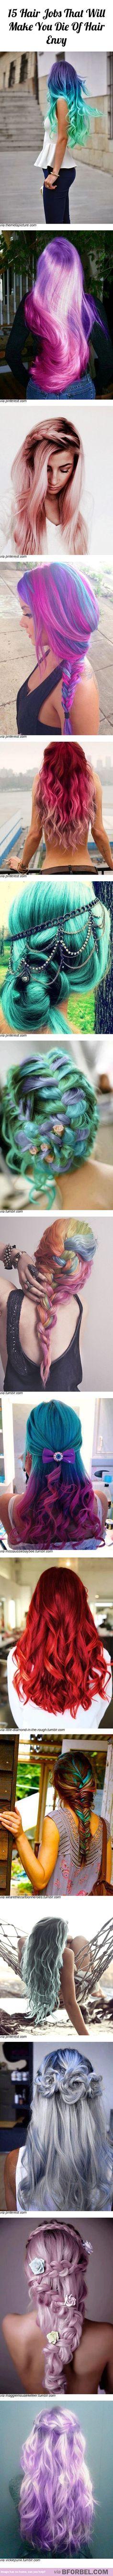 15 hair jobs that will make you die of hair envy